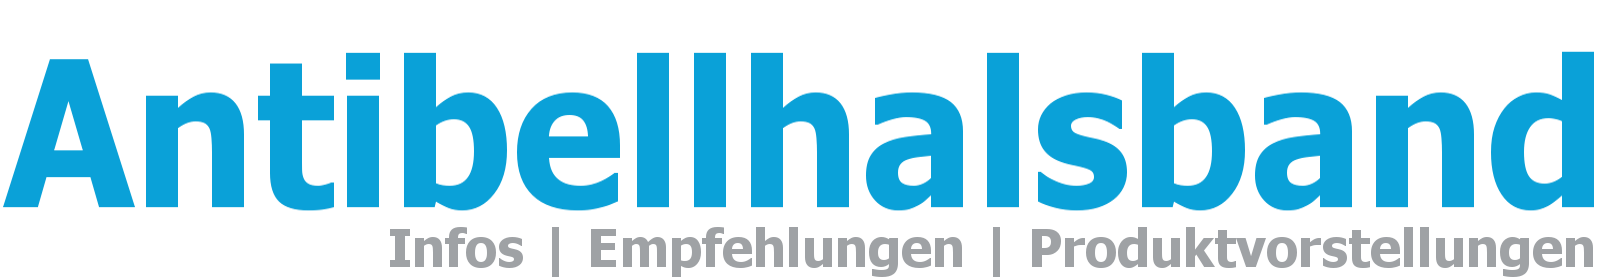 Antibellhalsband logo